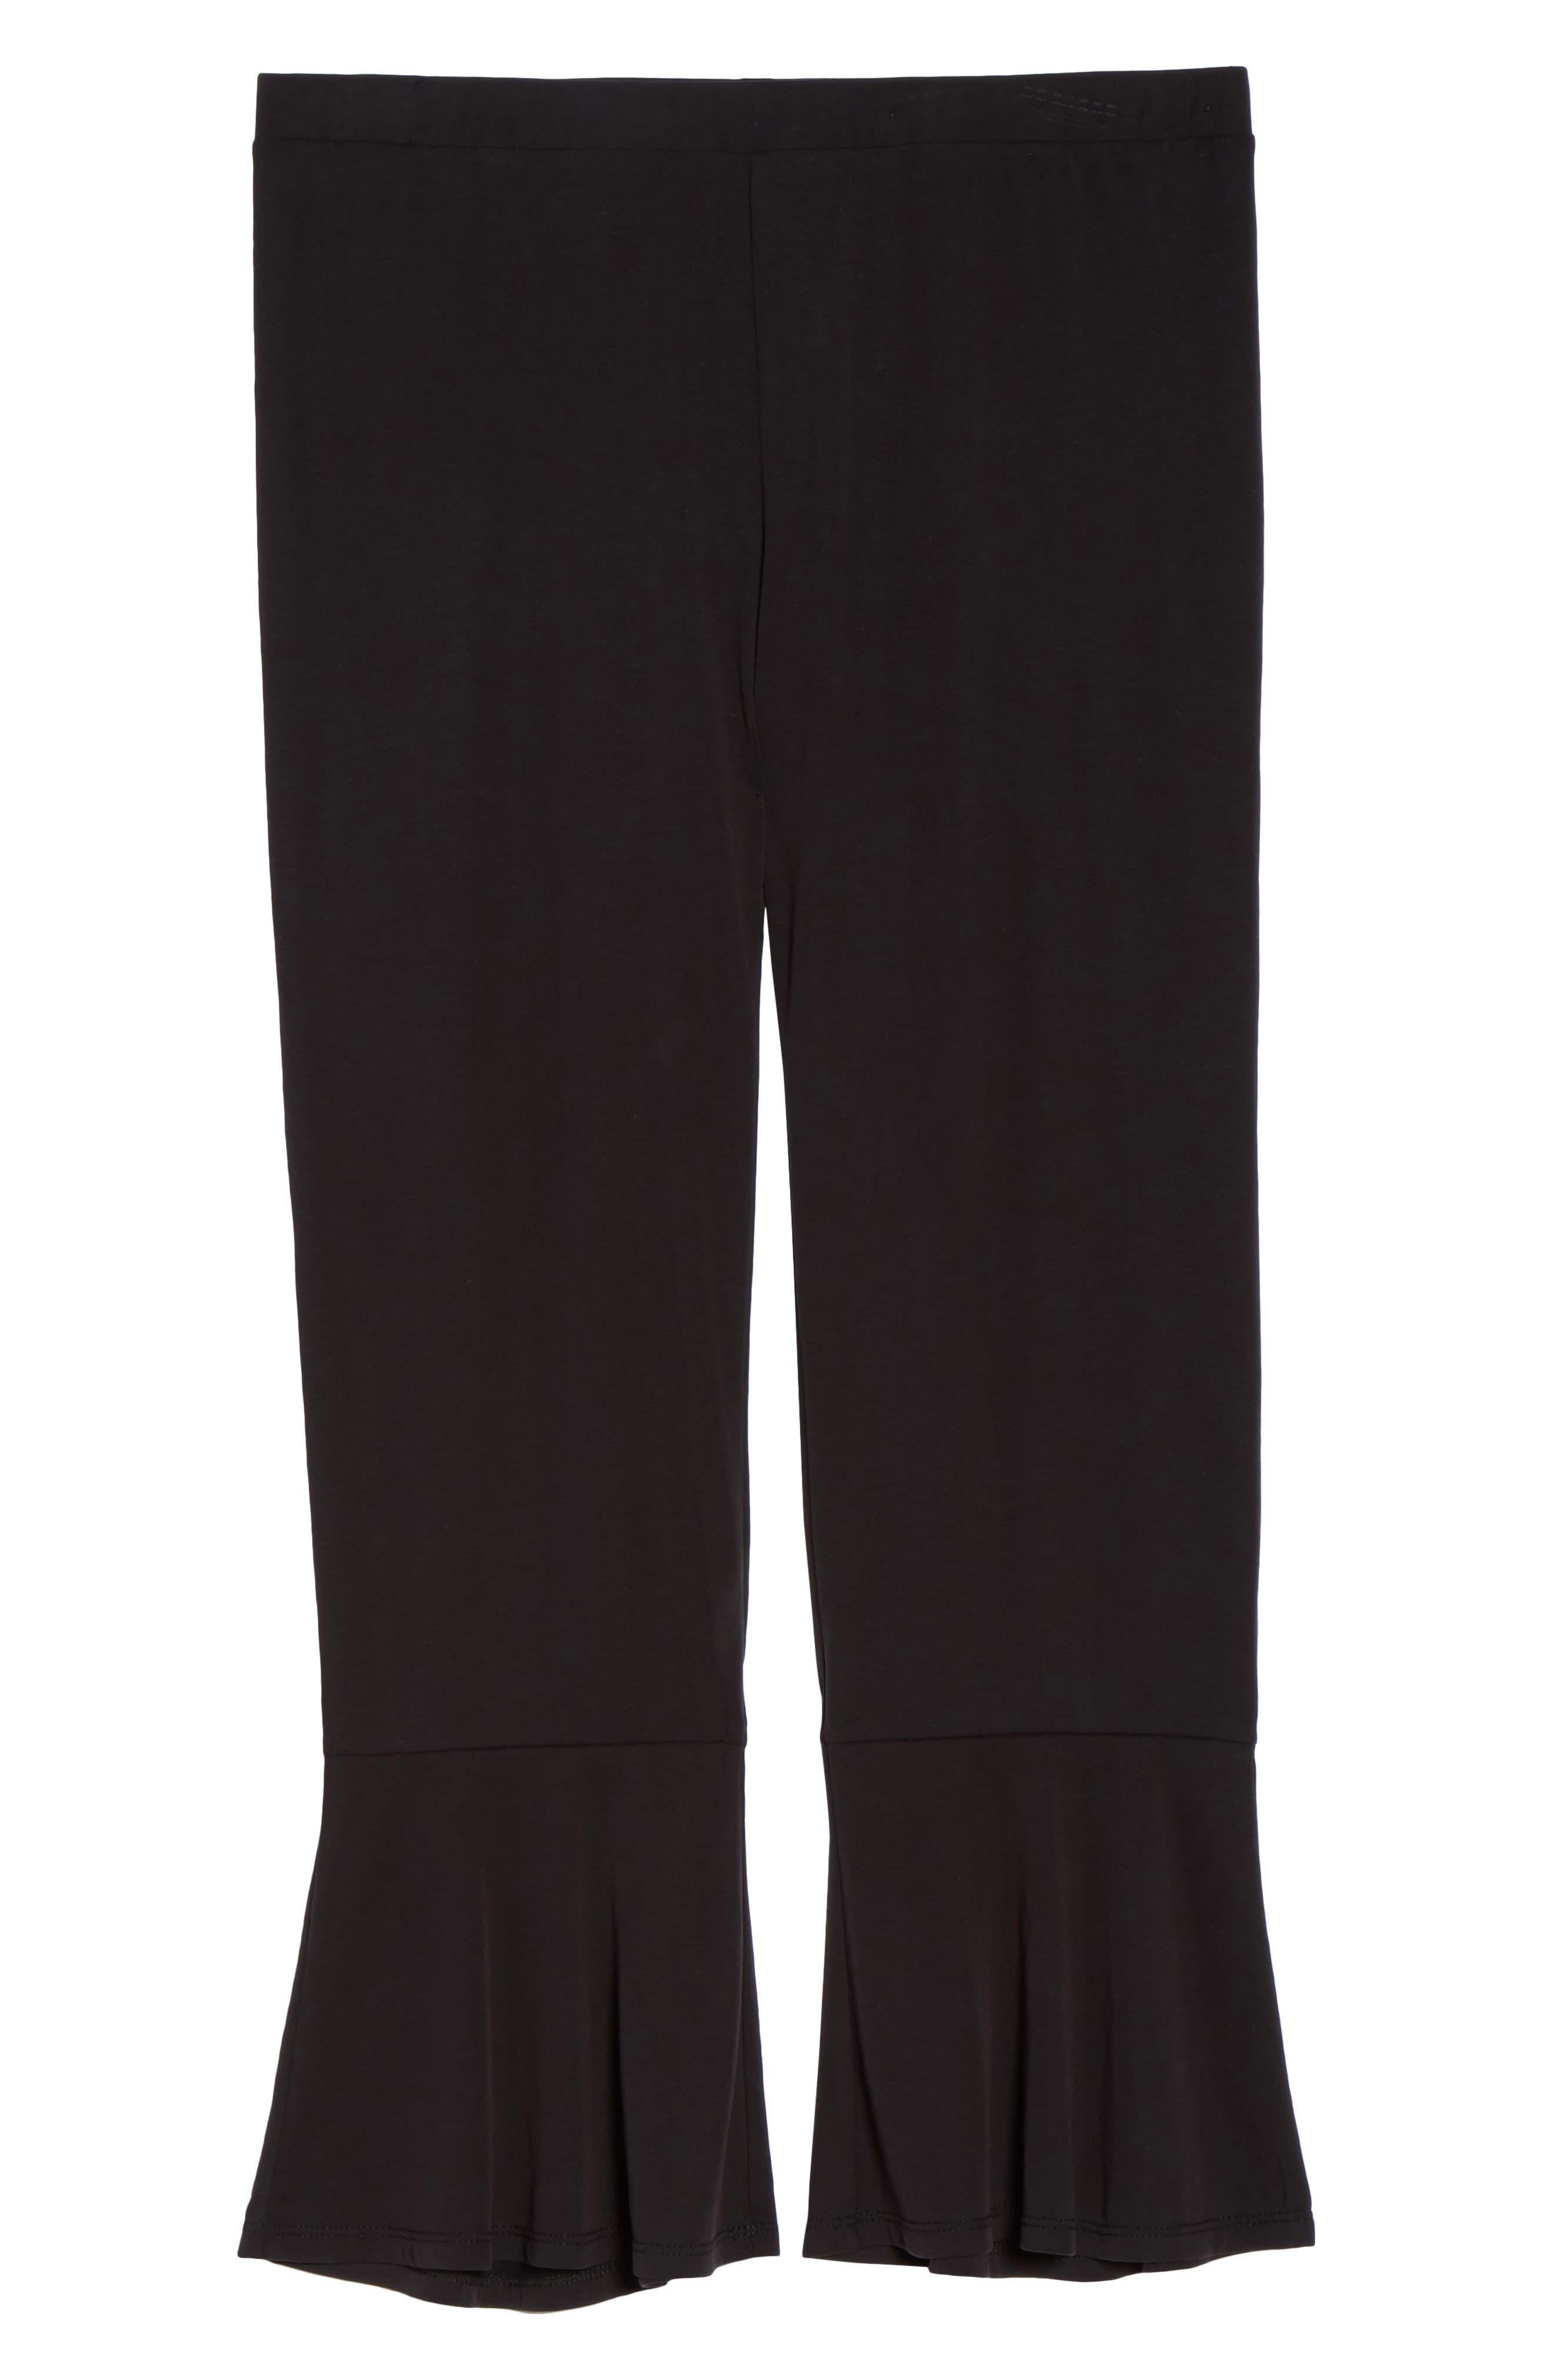 Aden Ruffle Hem Lounge Pants,                             Alternate thumbnail 6, color,                             BLACK